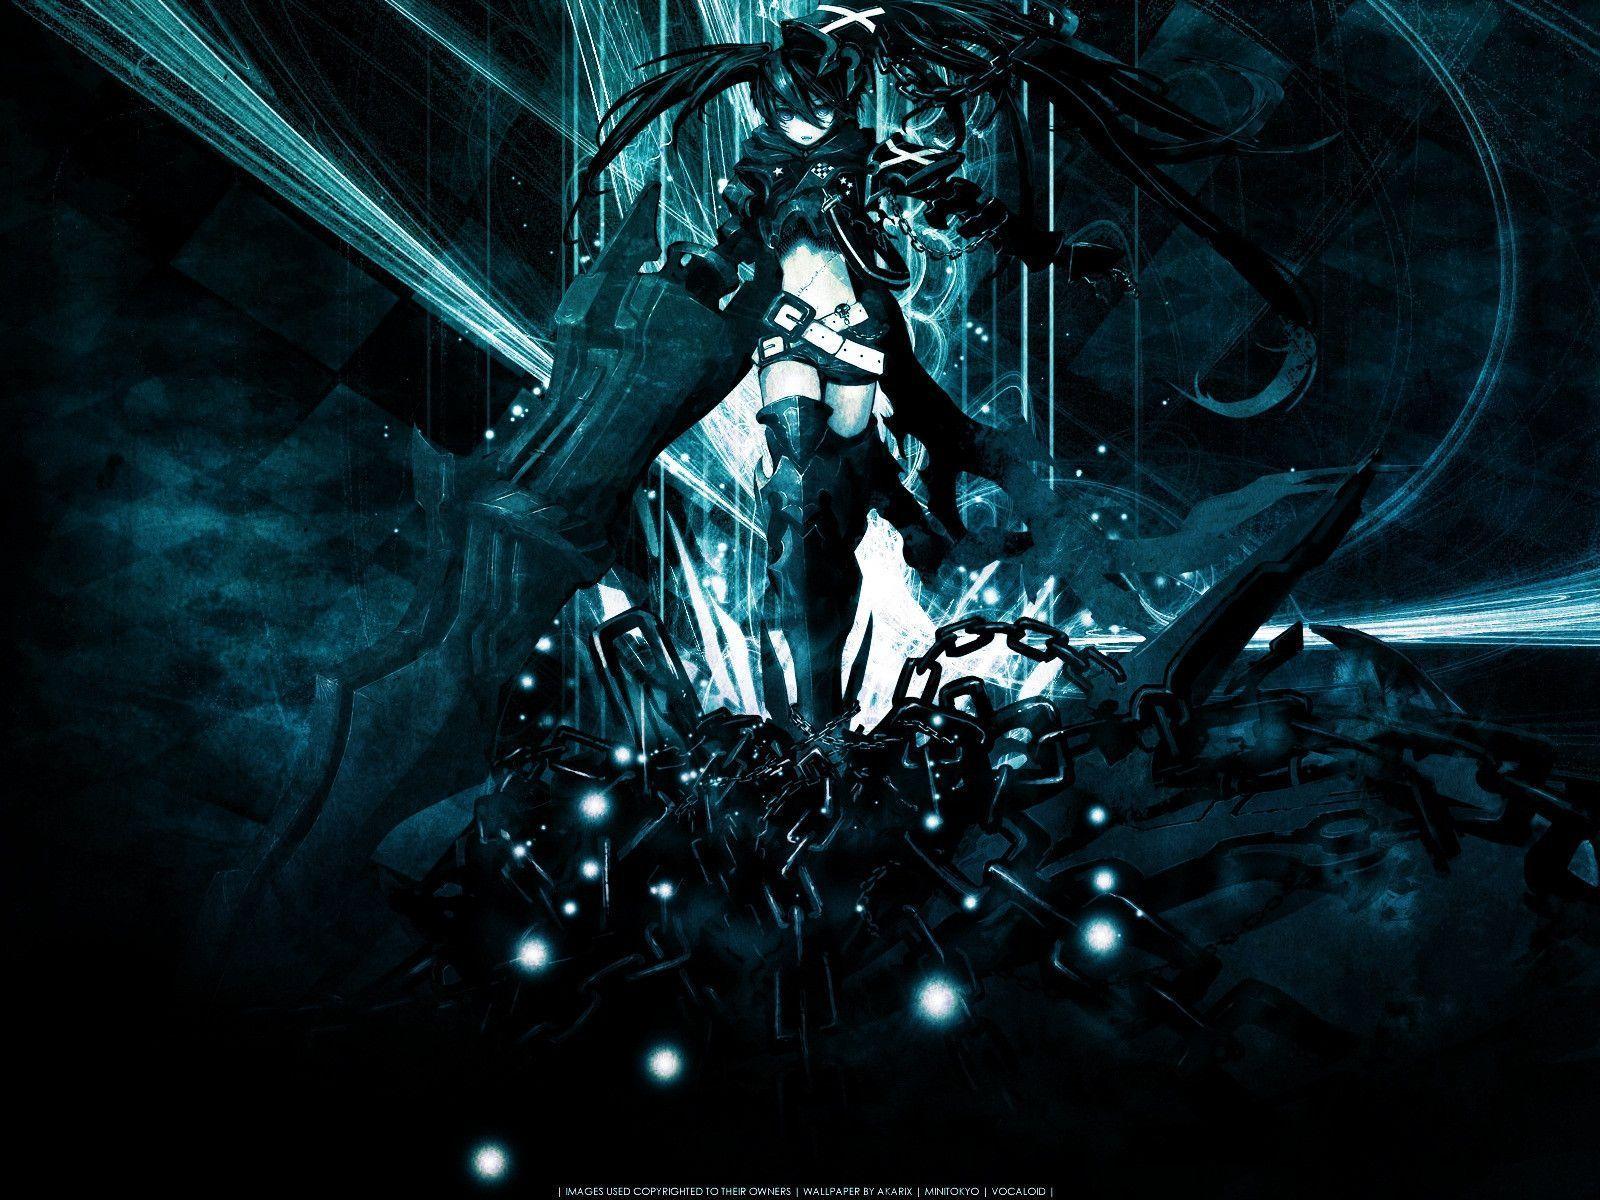 Dark Anime wallpaper | 2560x1600 | #59375